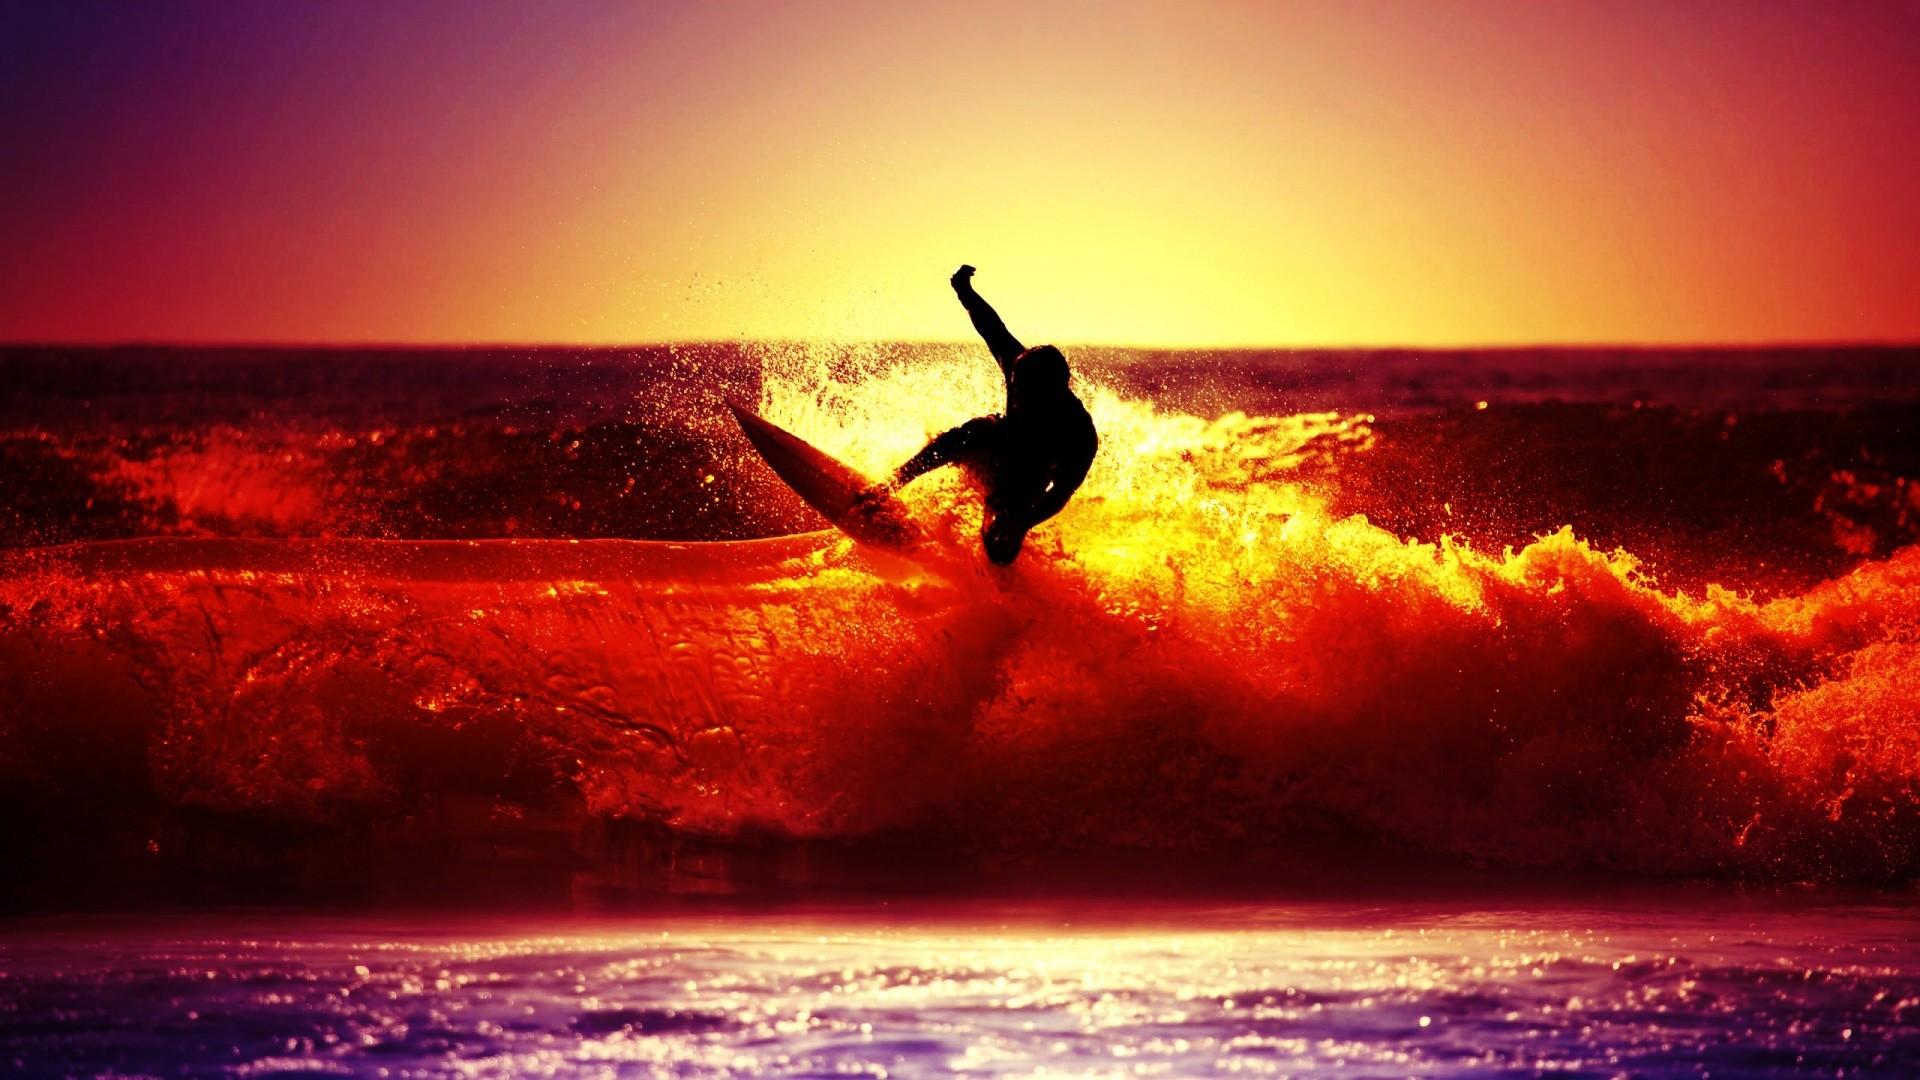 Free Tea Wallpaper · Surfing Wallpaper